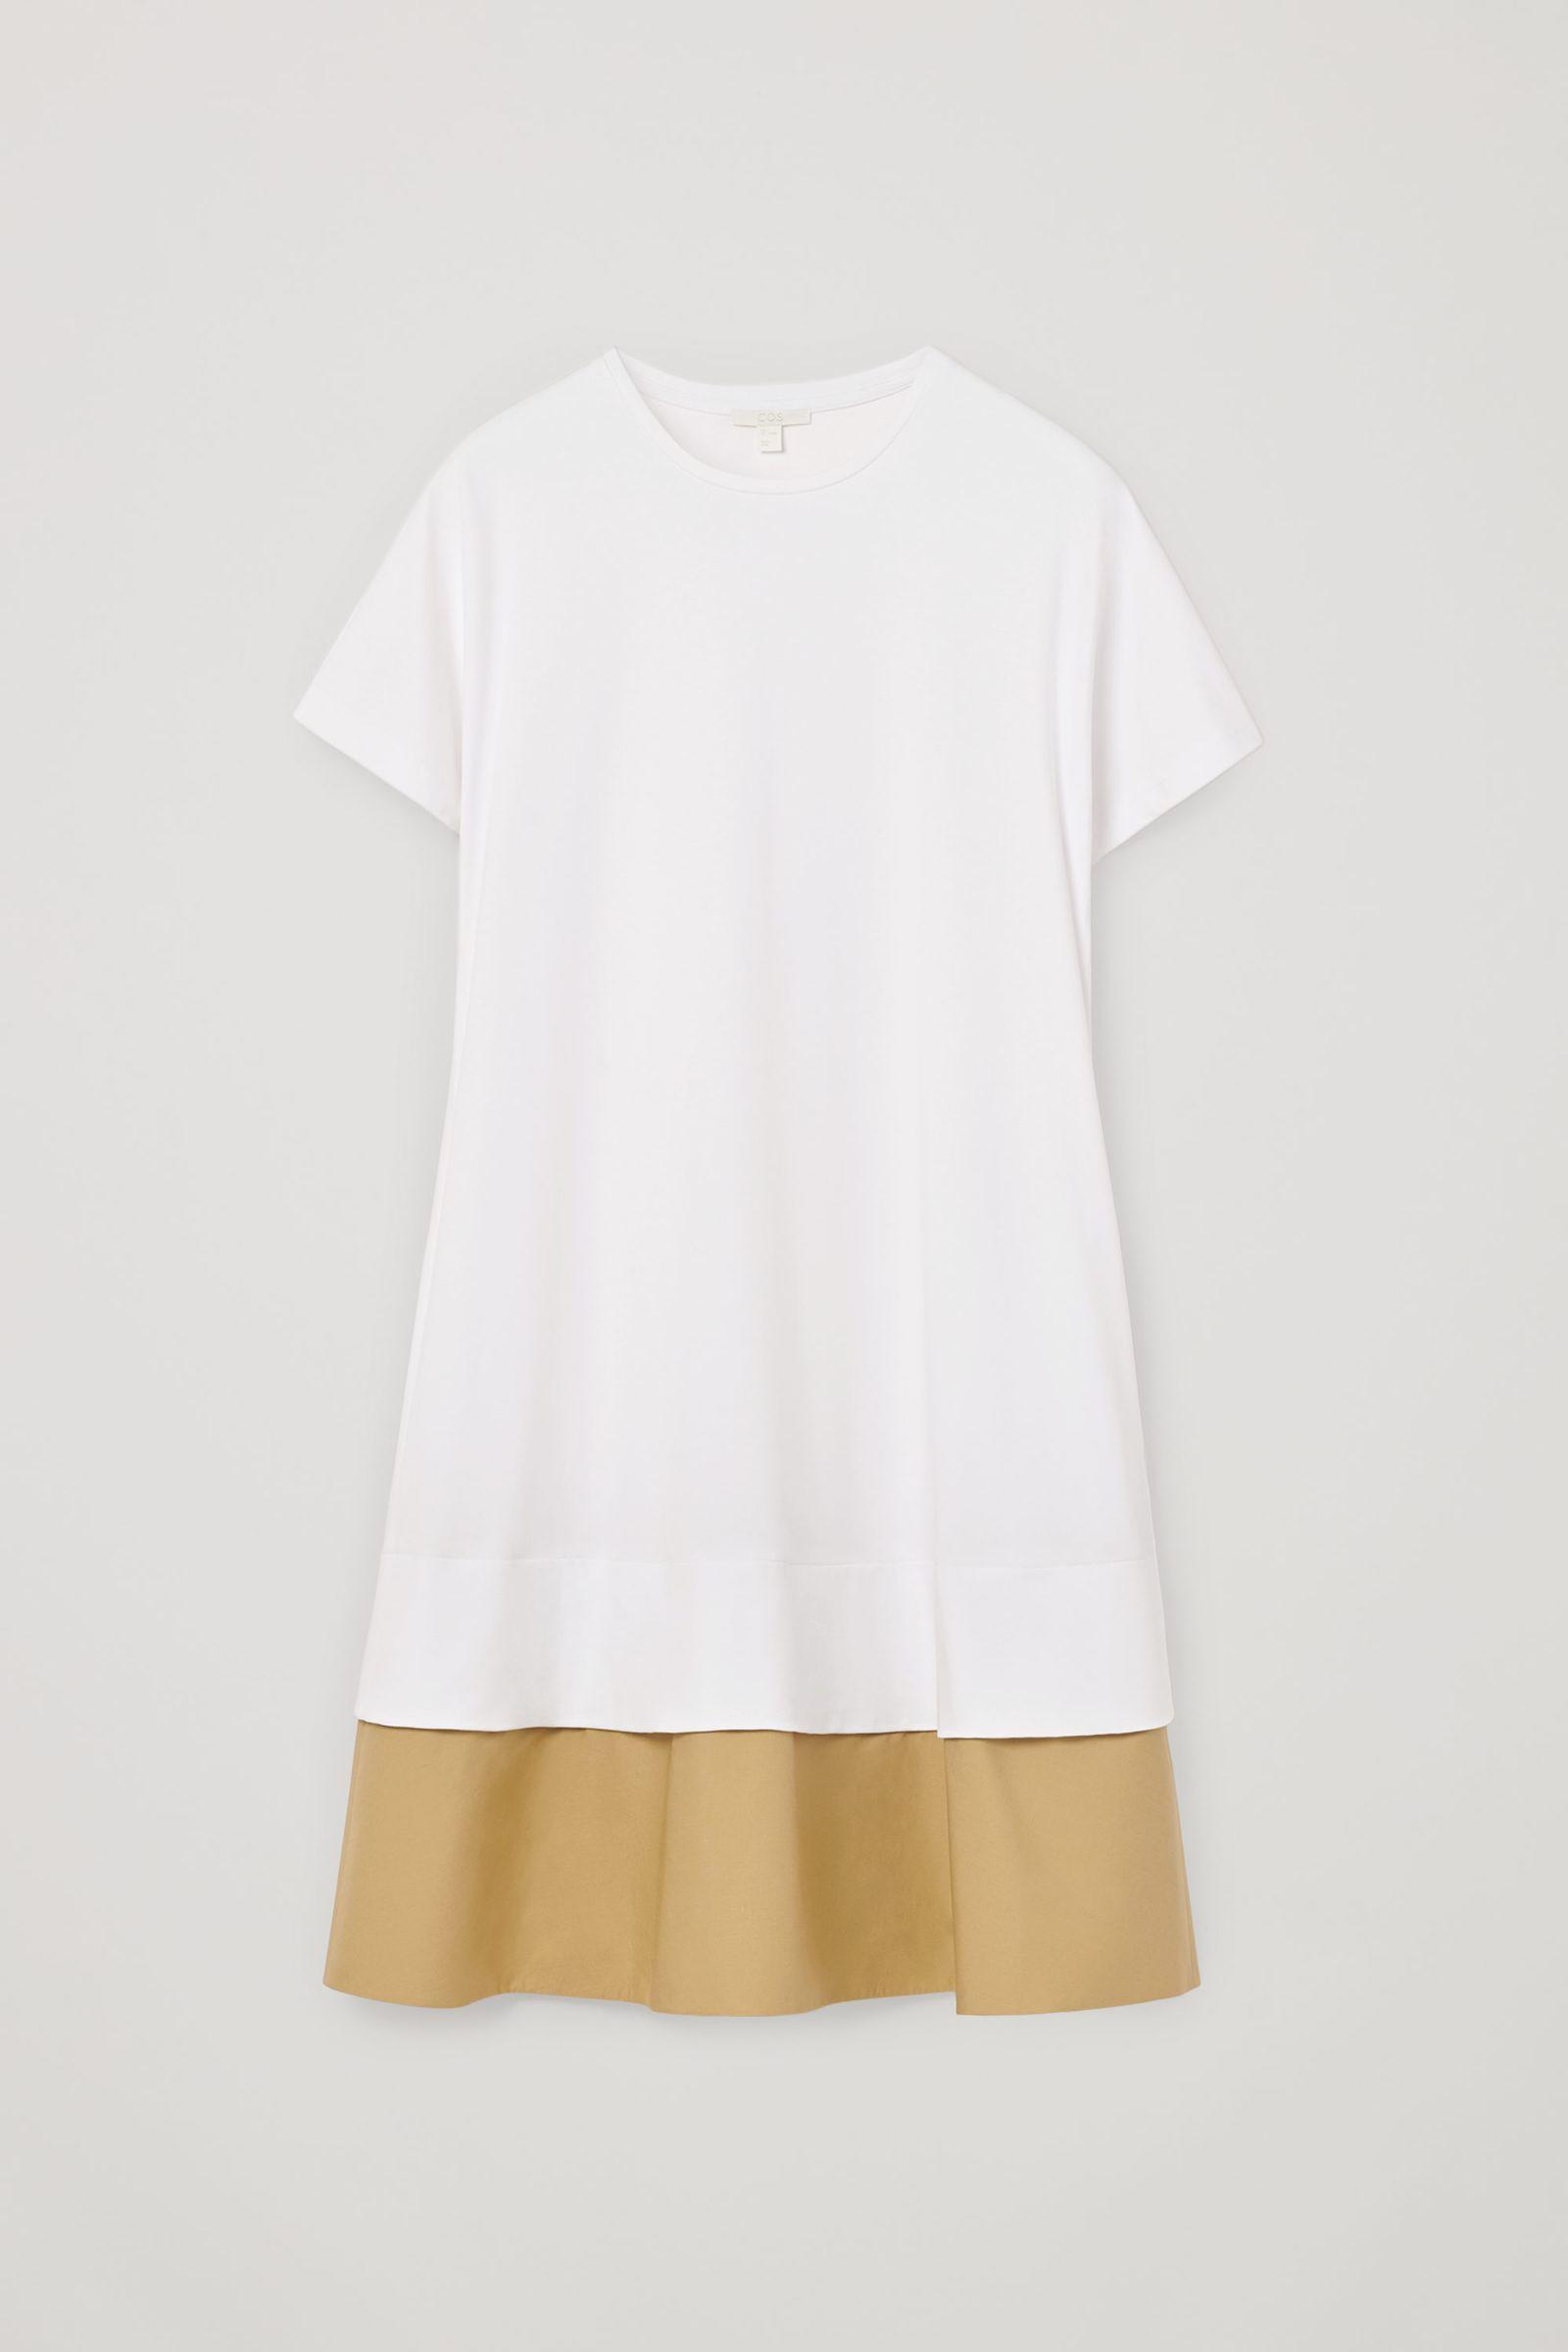 COS 컨트래스트 헴 드레스의 화이트컬러 Product입니다.